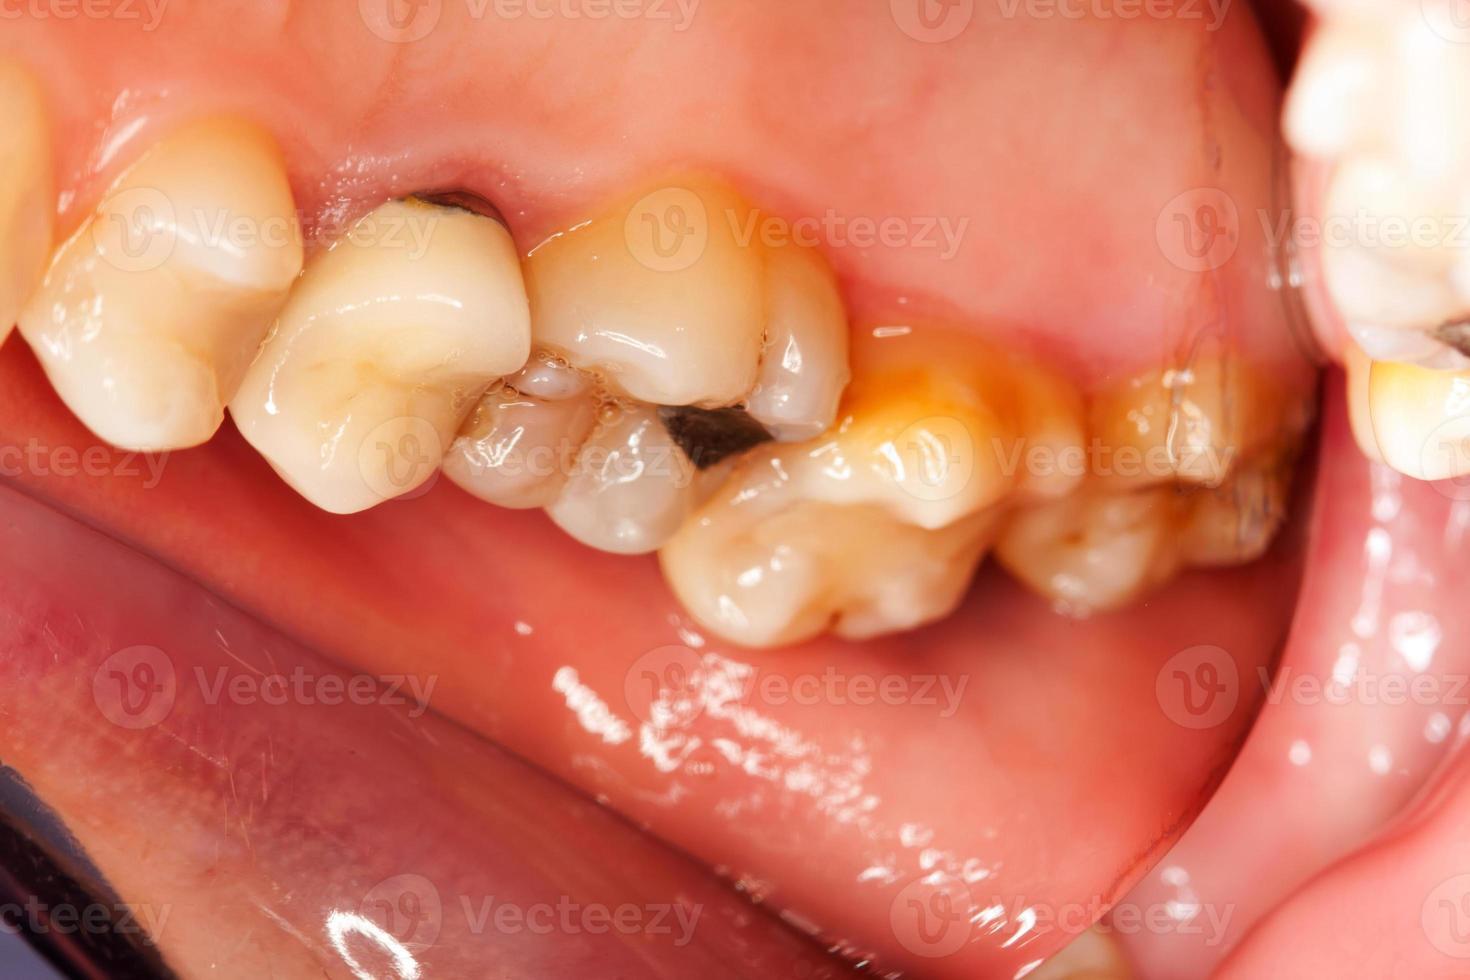 problemi dentali foto